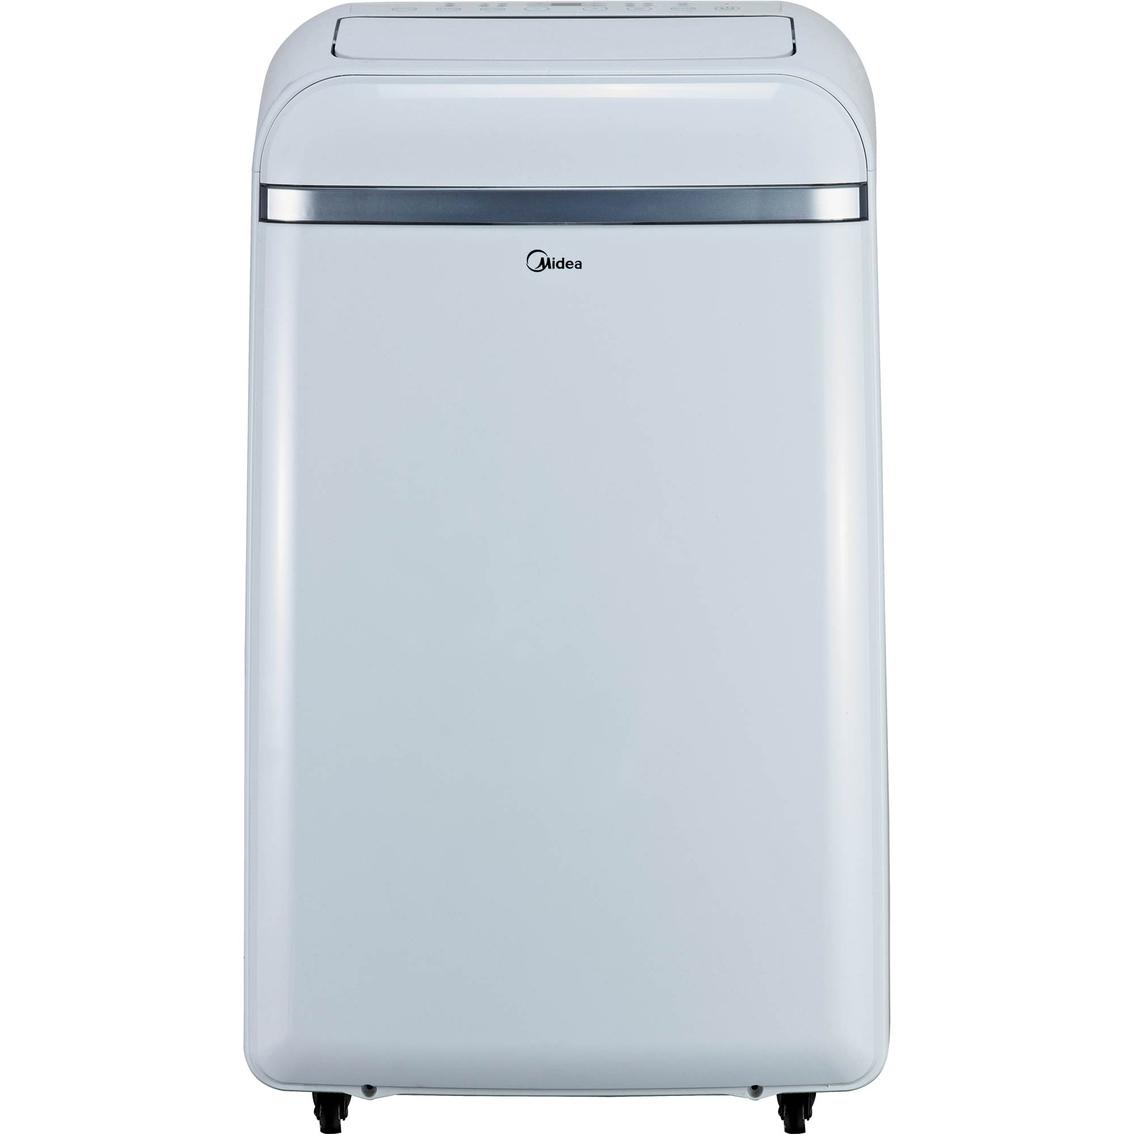 Midea 14 000 btu portable air conditioner portable air for 14 000 btu window air conditioner